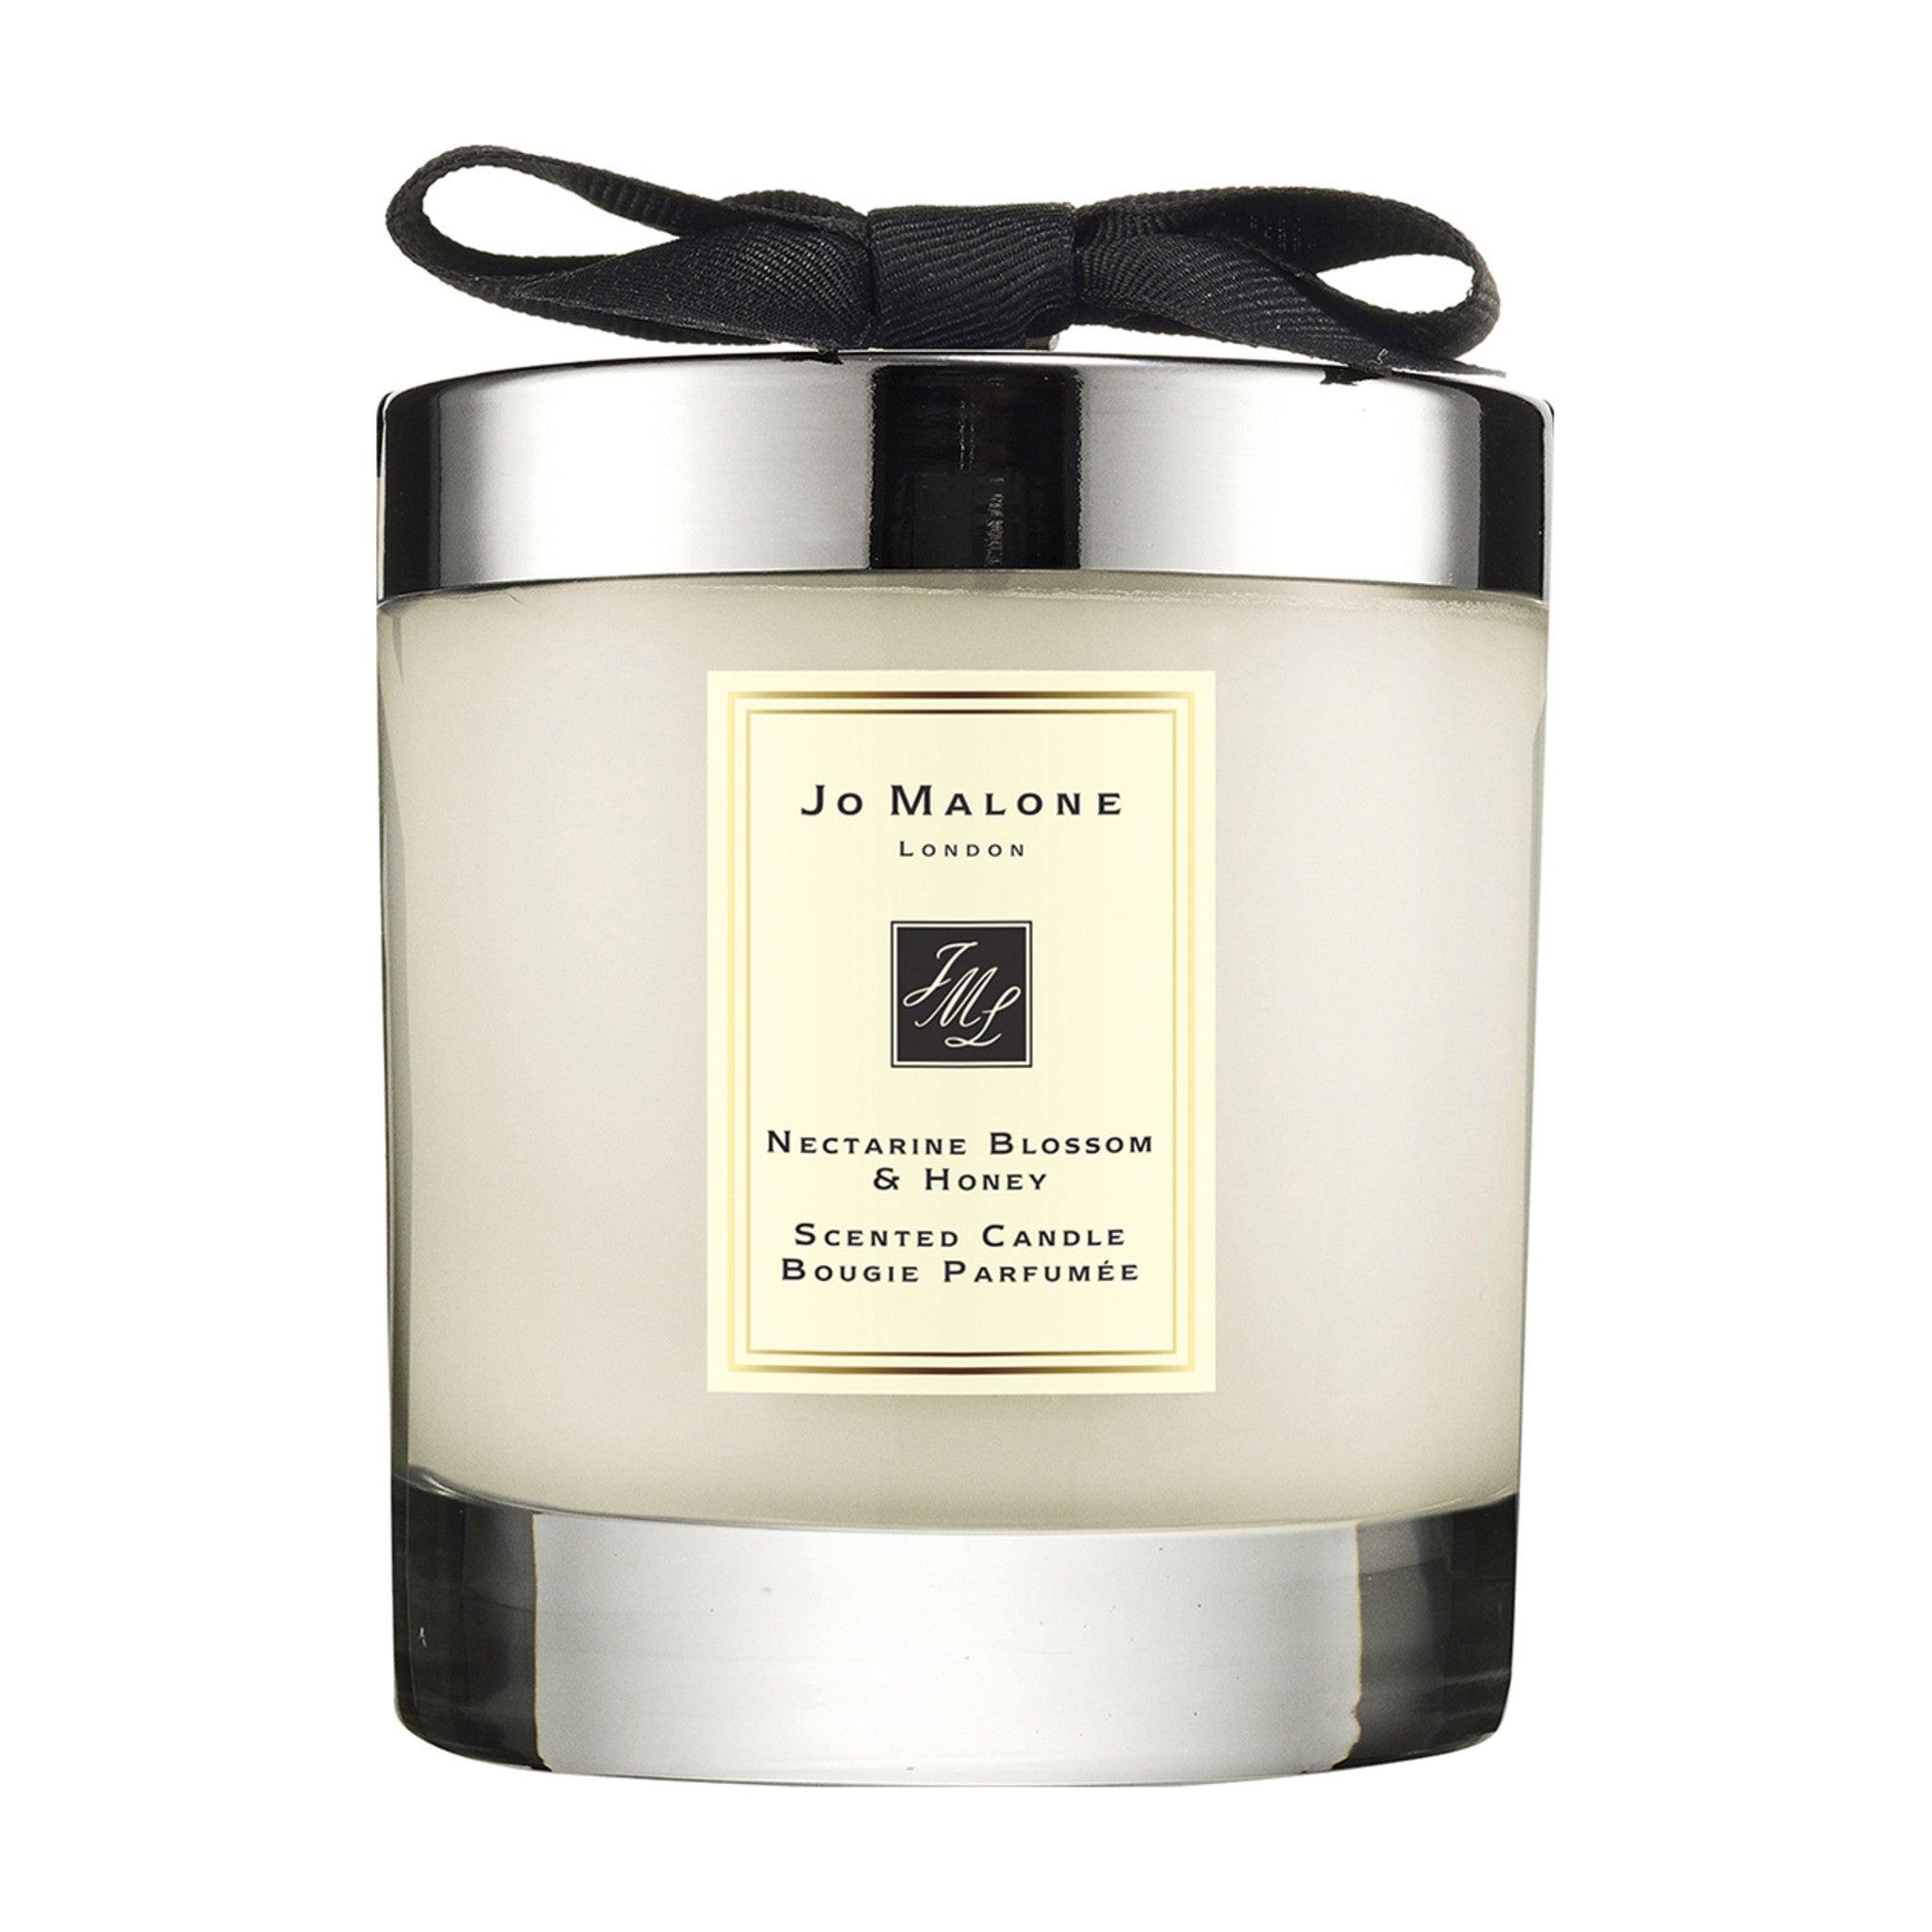 Jo Malone London Nectarine Blossom & Honey Home Candle